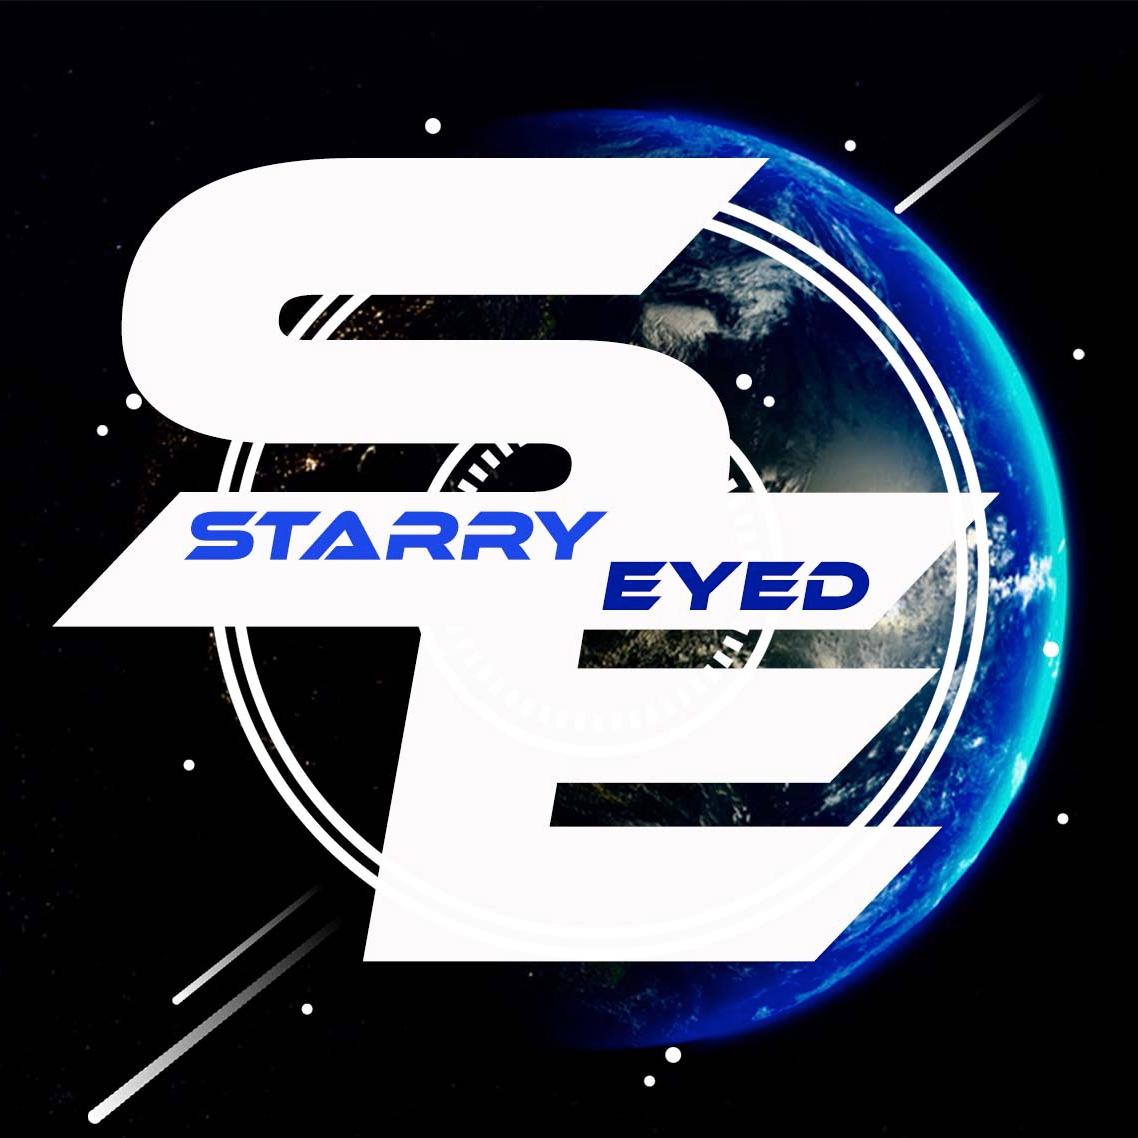 Starry Eyed Press